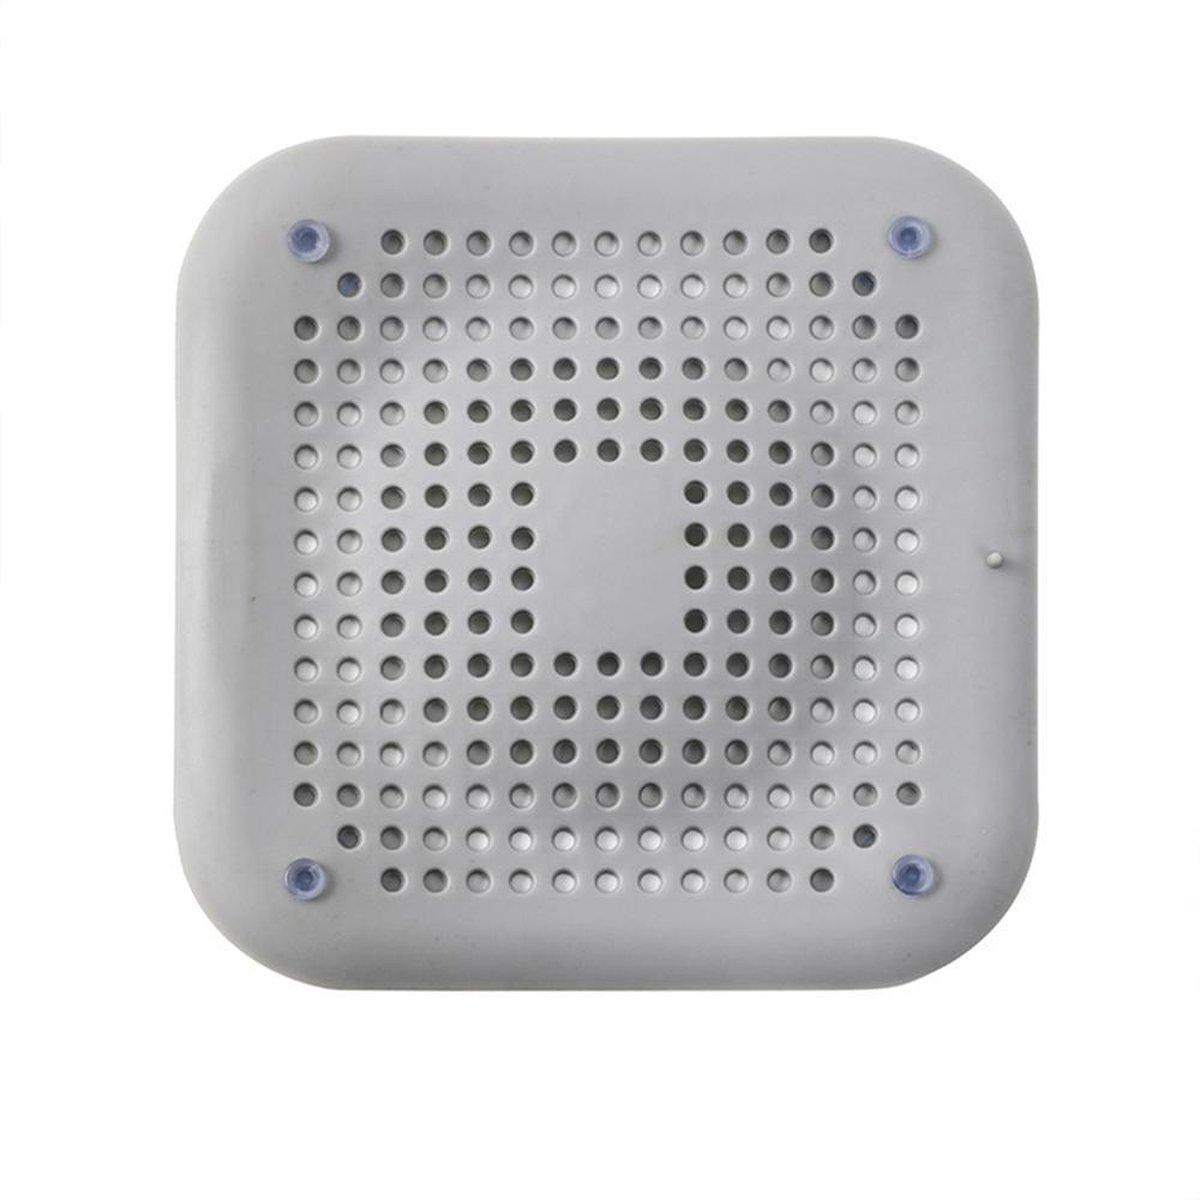 Silicone afvoerstop - Anti haar afvoer stop - Afvoerplug